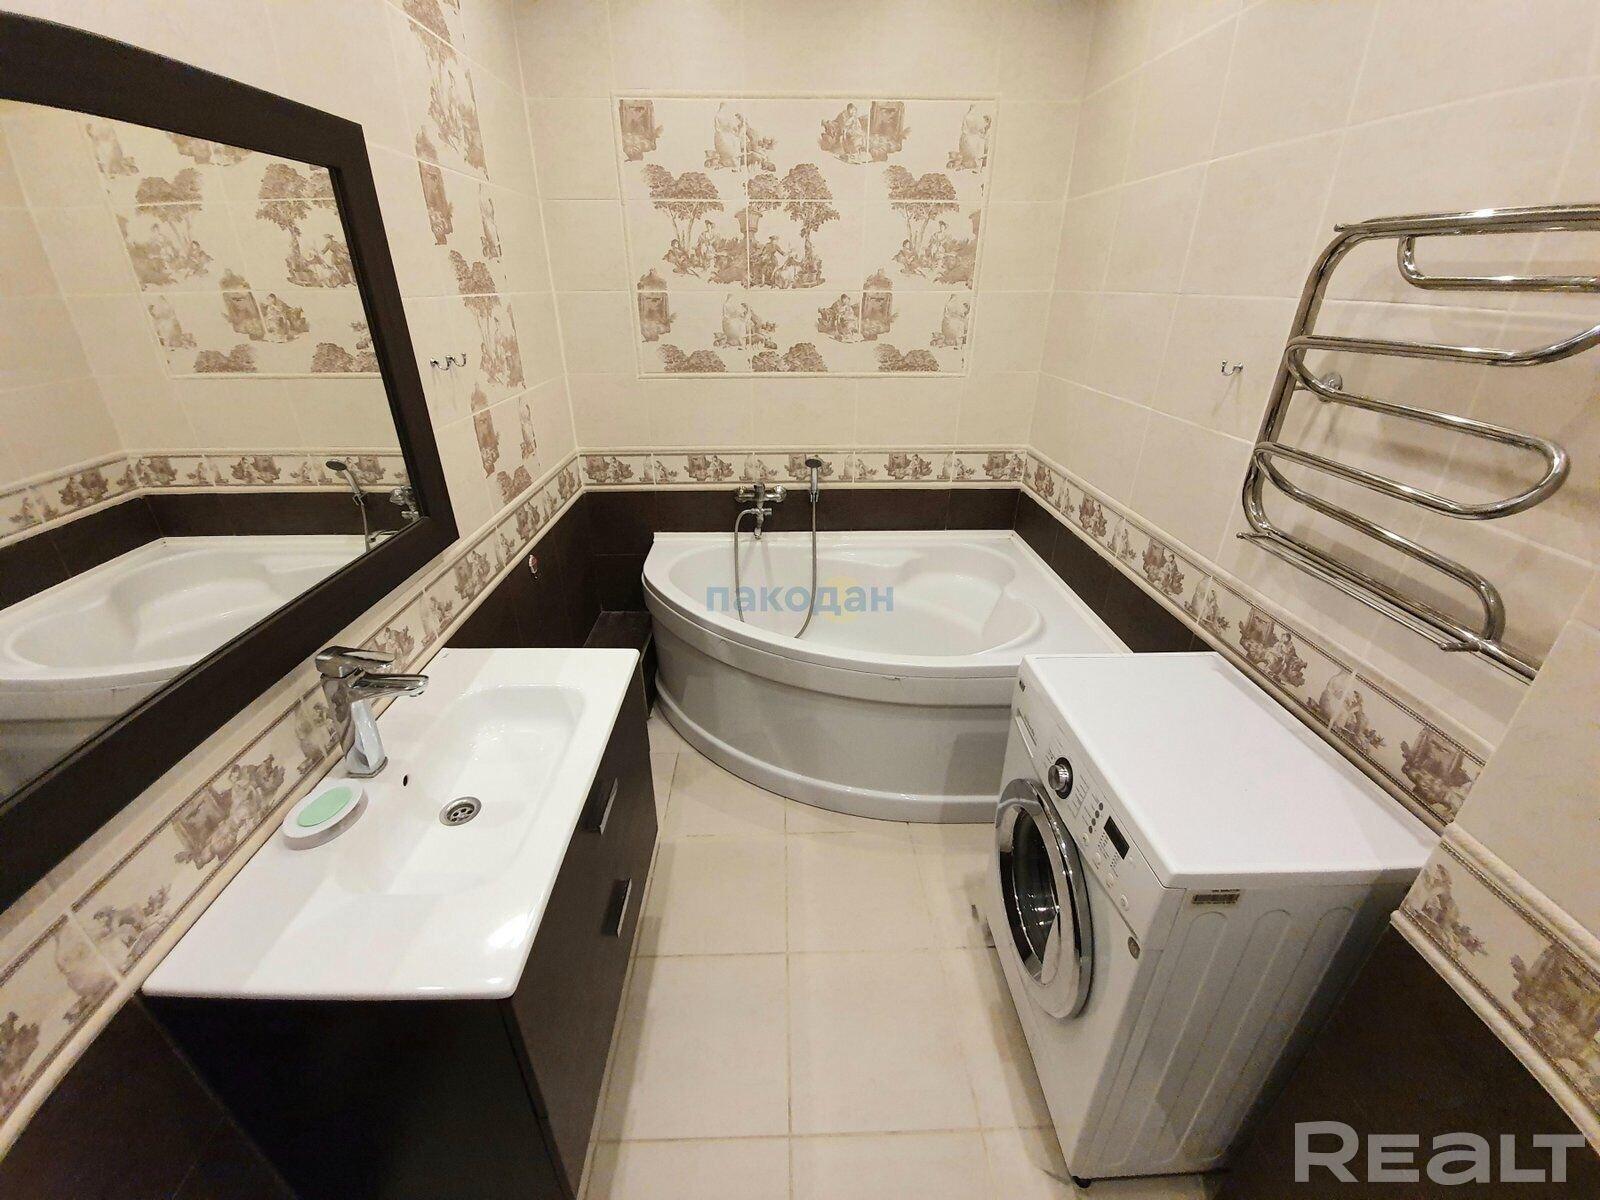 Продается 2-х комнатная квартира, Копище - фото №20